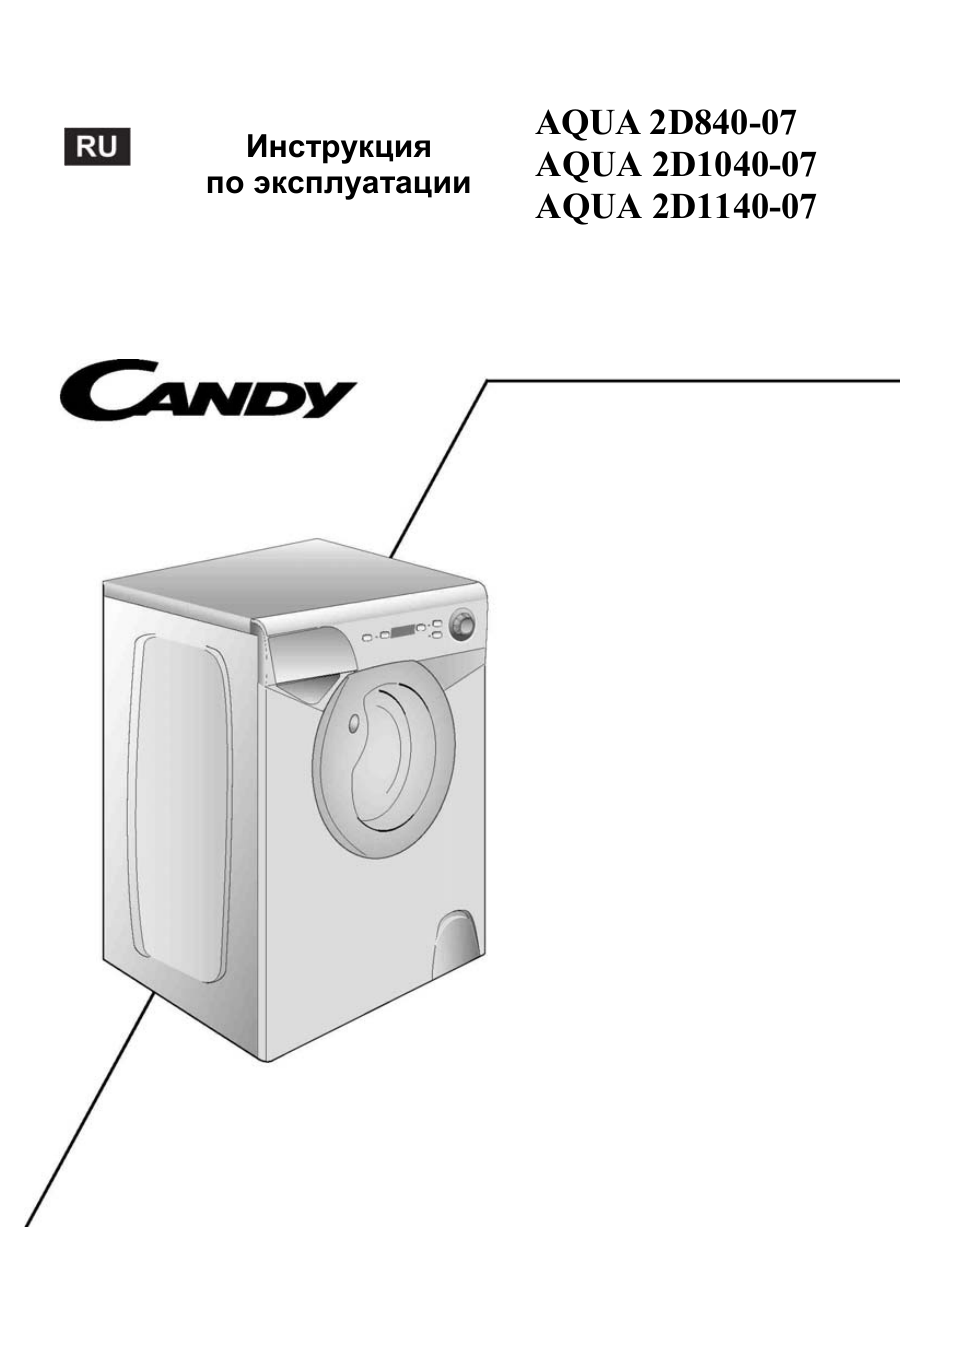 Инструкция по эксплуатации AQUA .